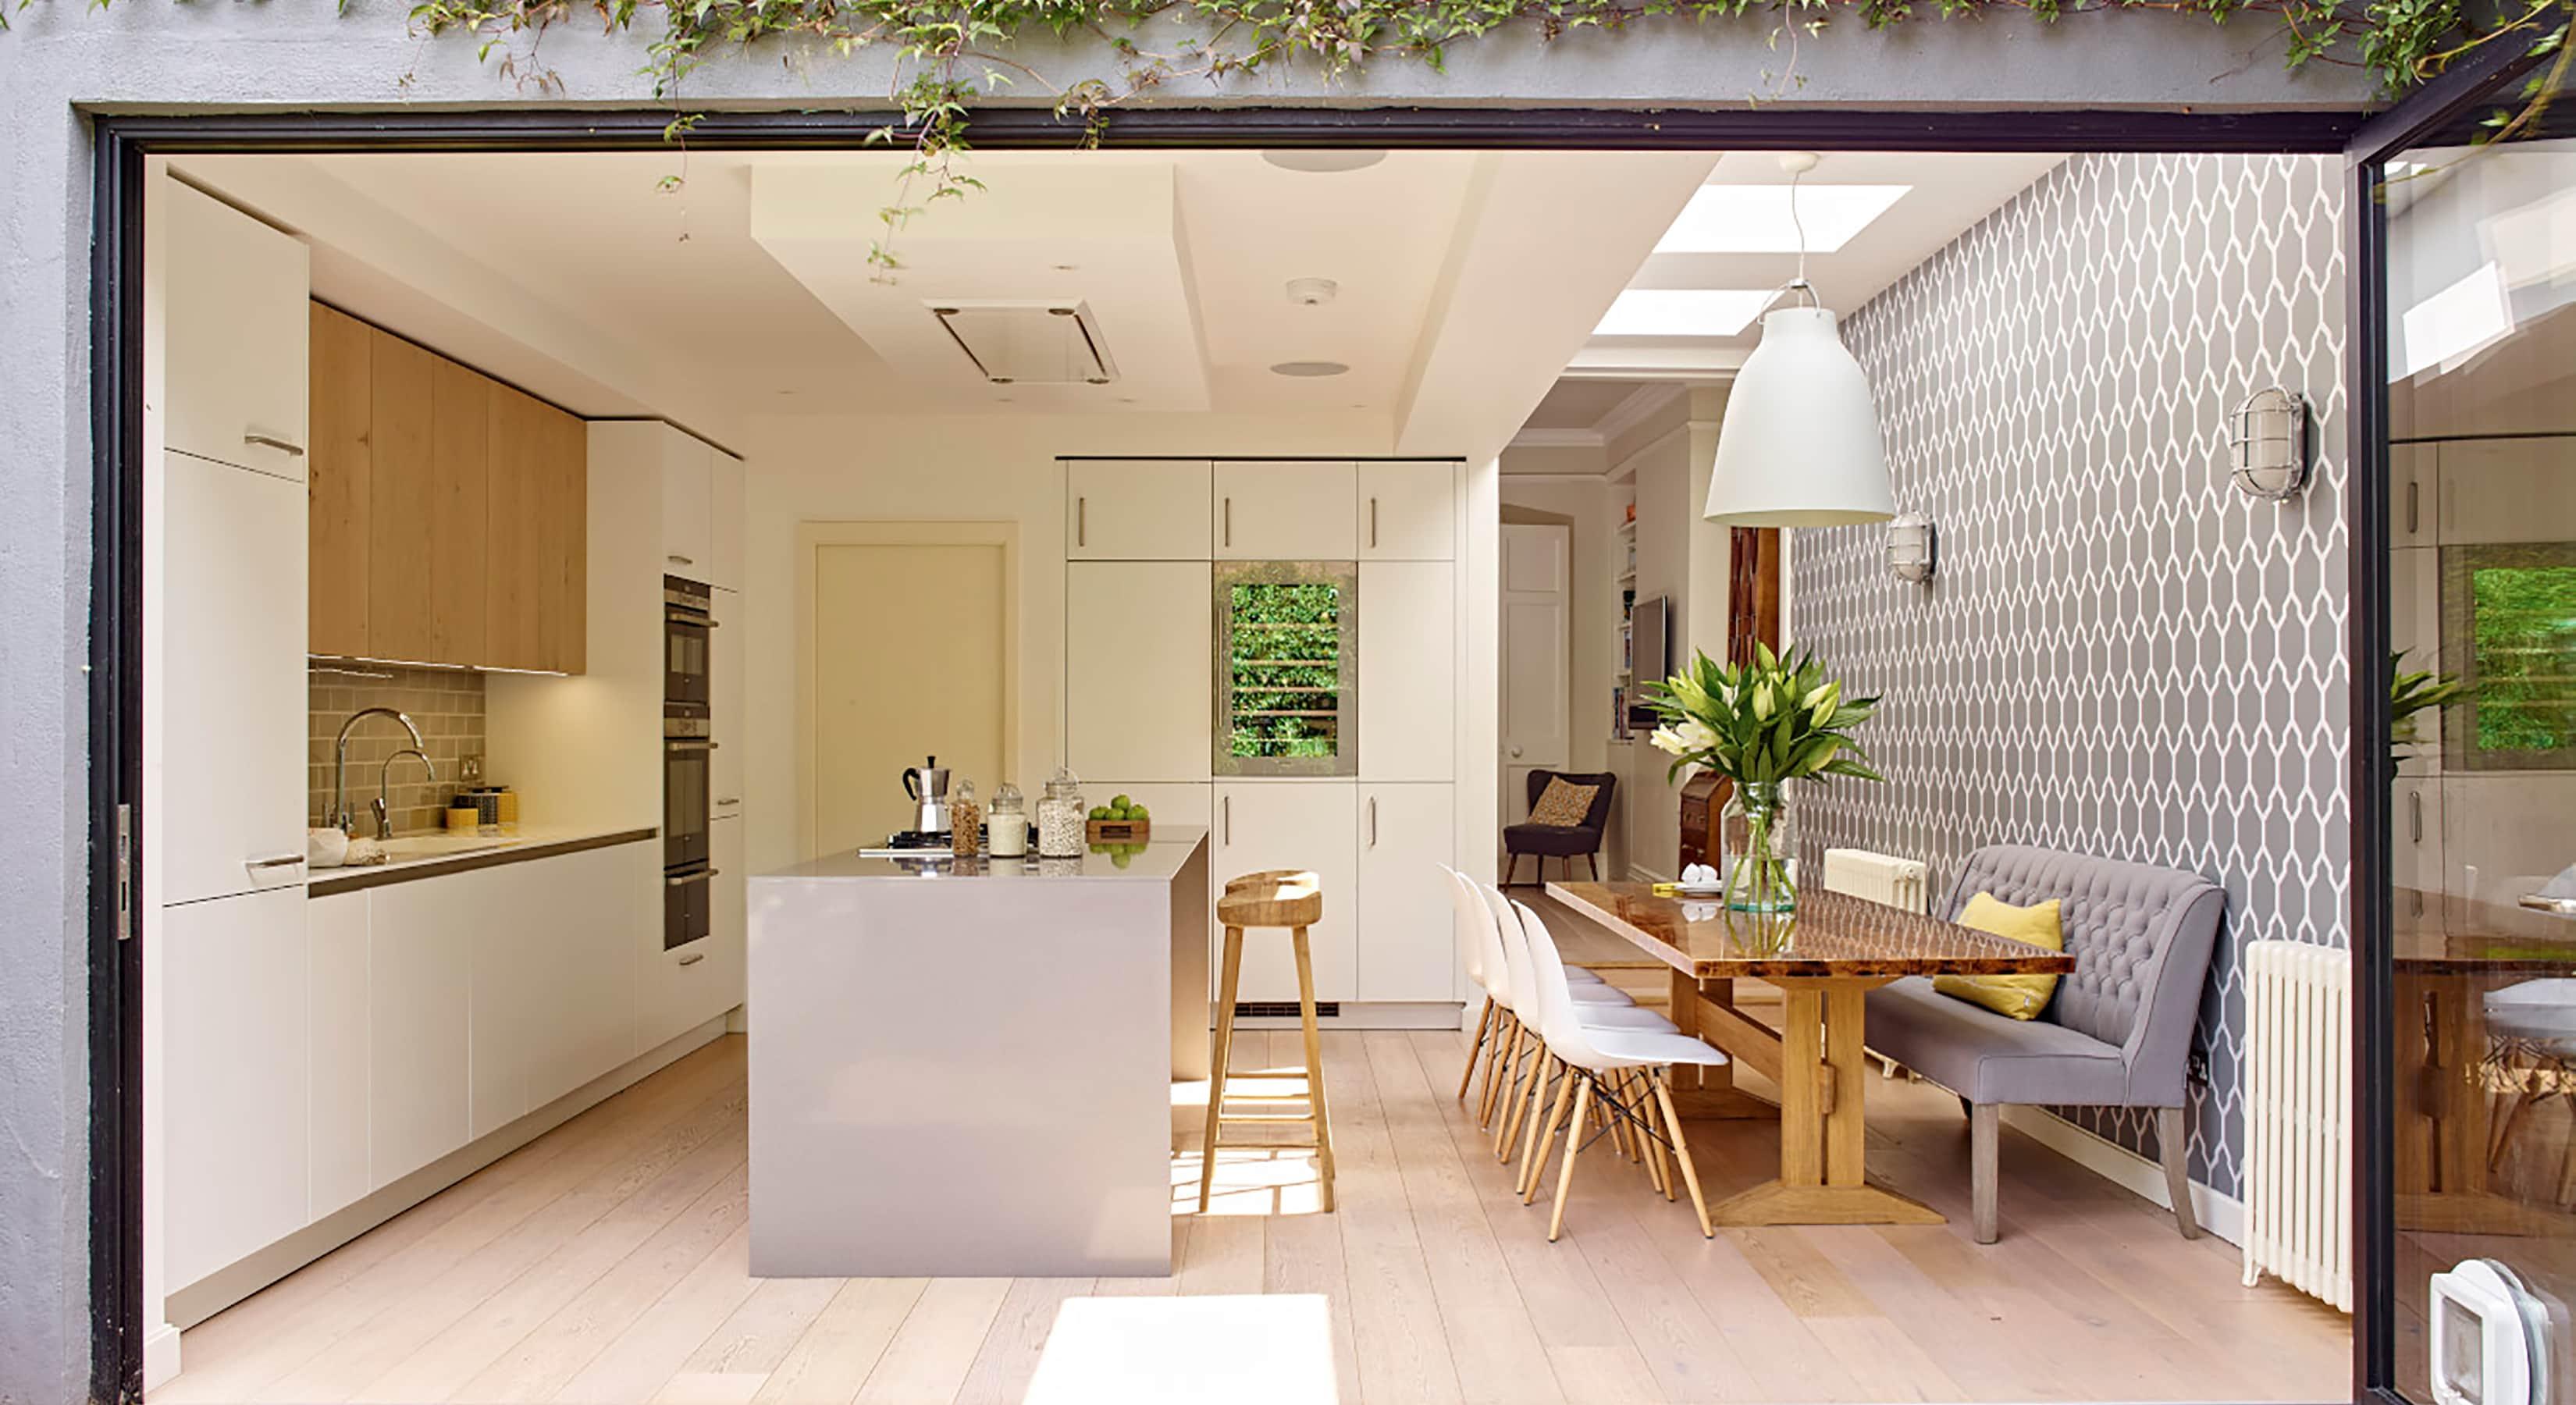 Tregenza kitchen extension concept